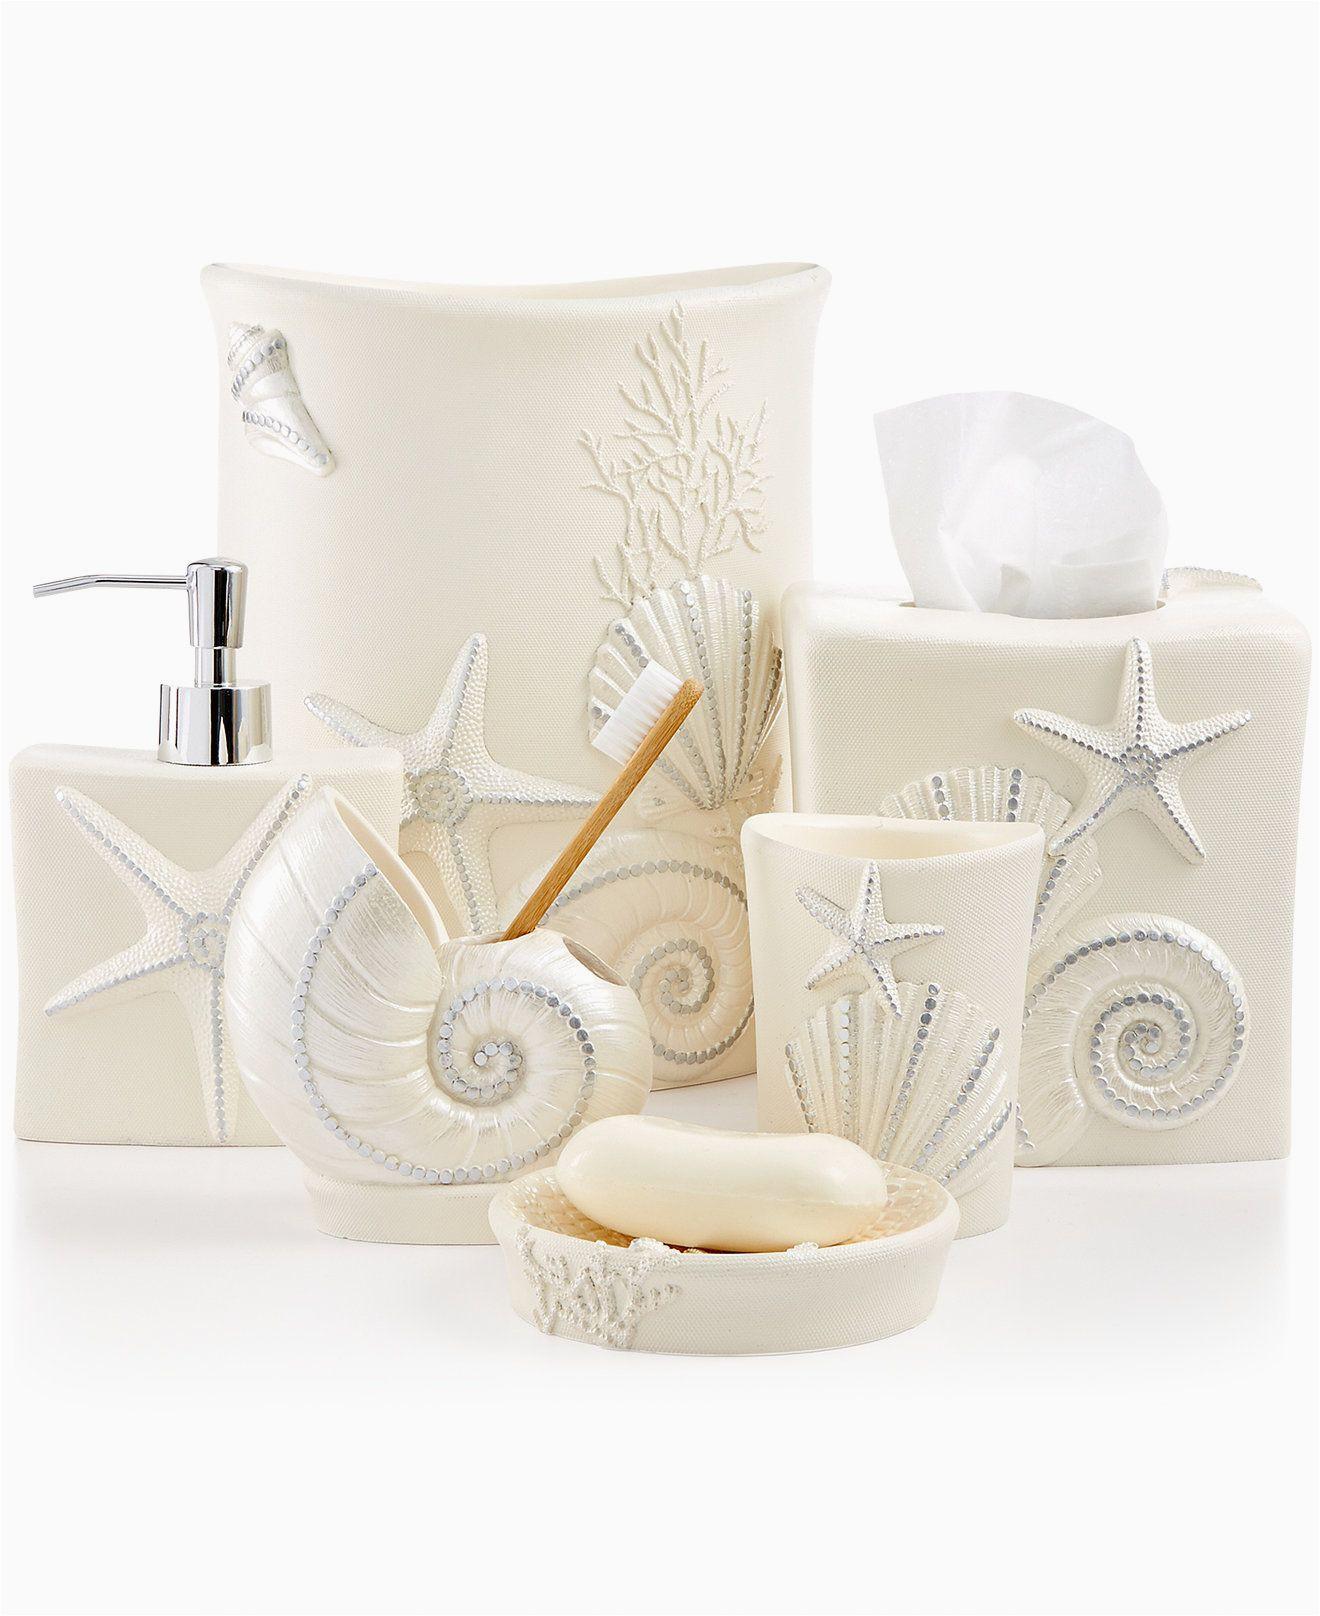 Avanti Sequin Shell Bath Rug Avanti Bath Sequin Shells Accessories Collection Bathroom